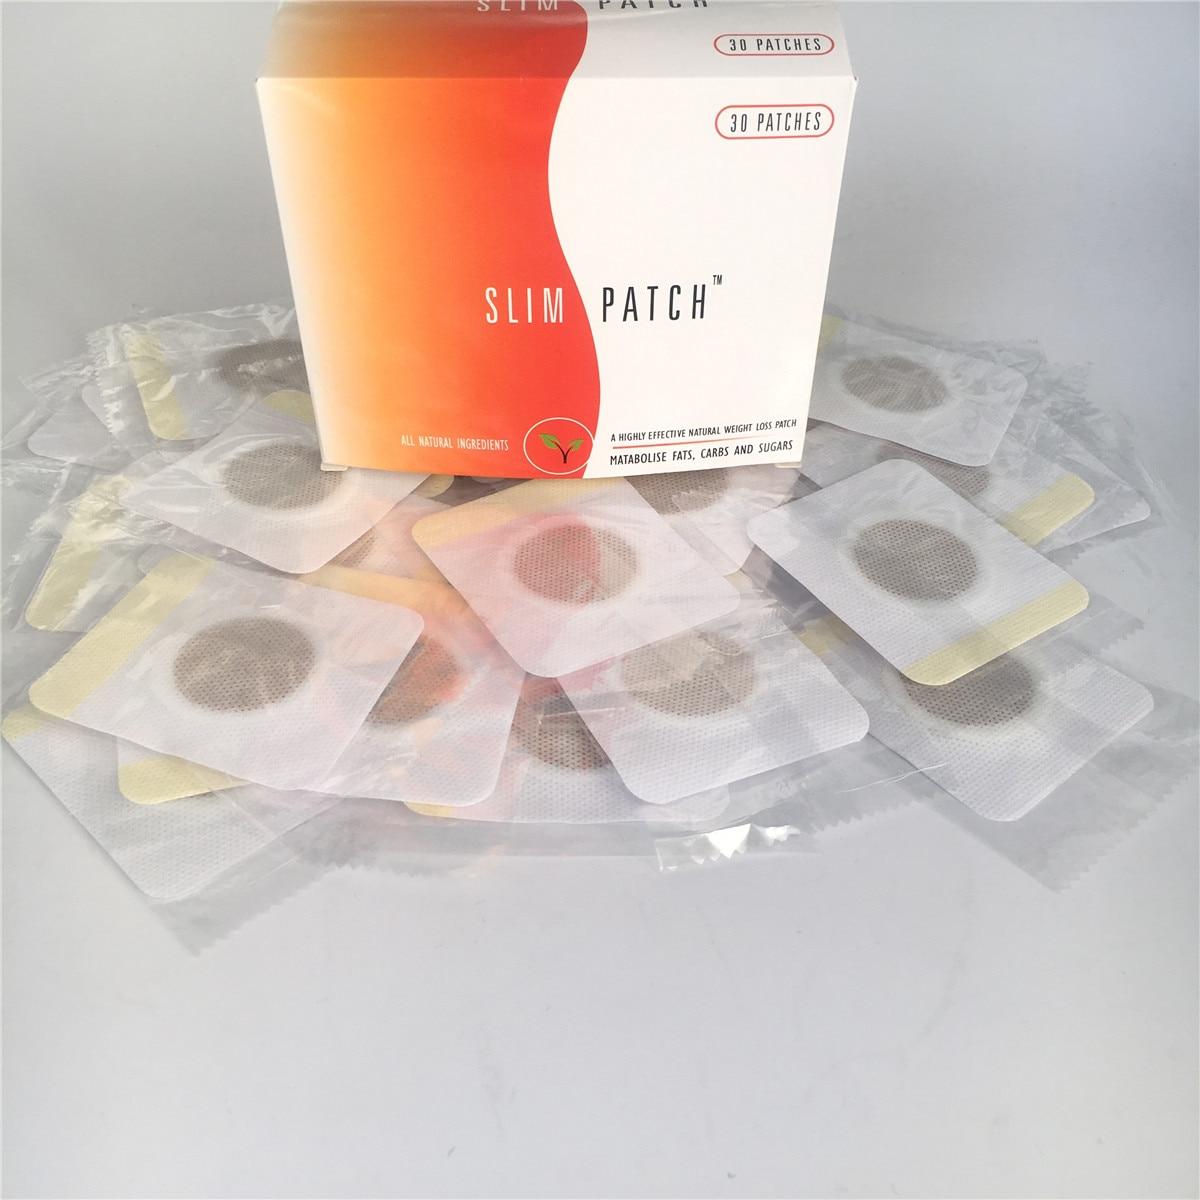 30pcs Slim Patch Stomach Fat Burning Navel Stick Slimming Lose Weight Burn Fat Anti Cellulite Abdomen